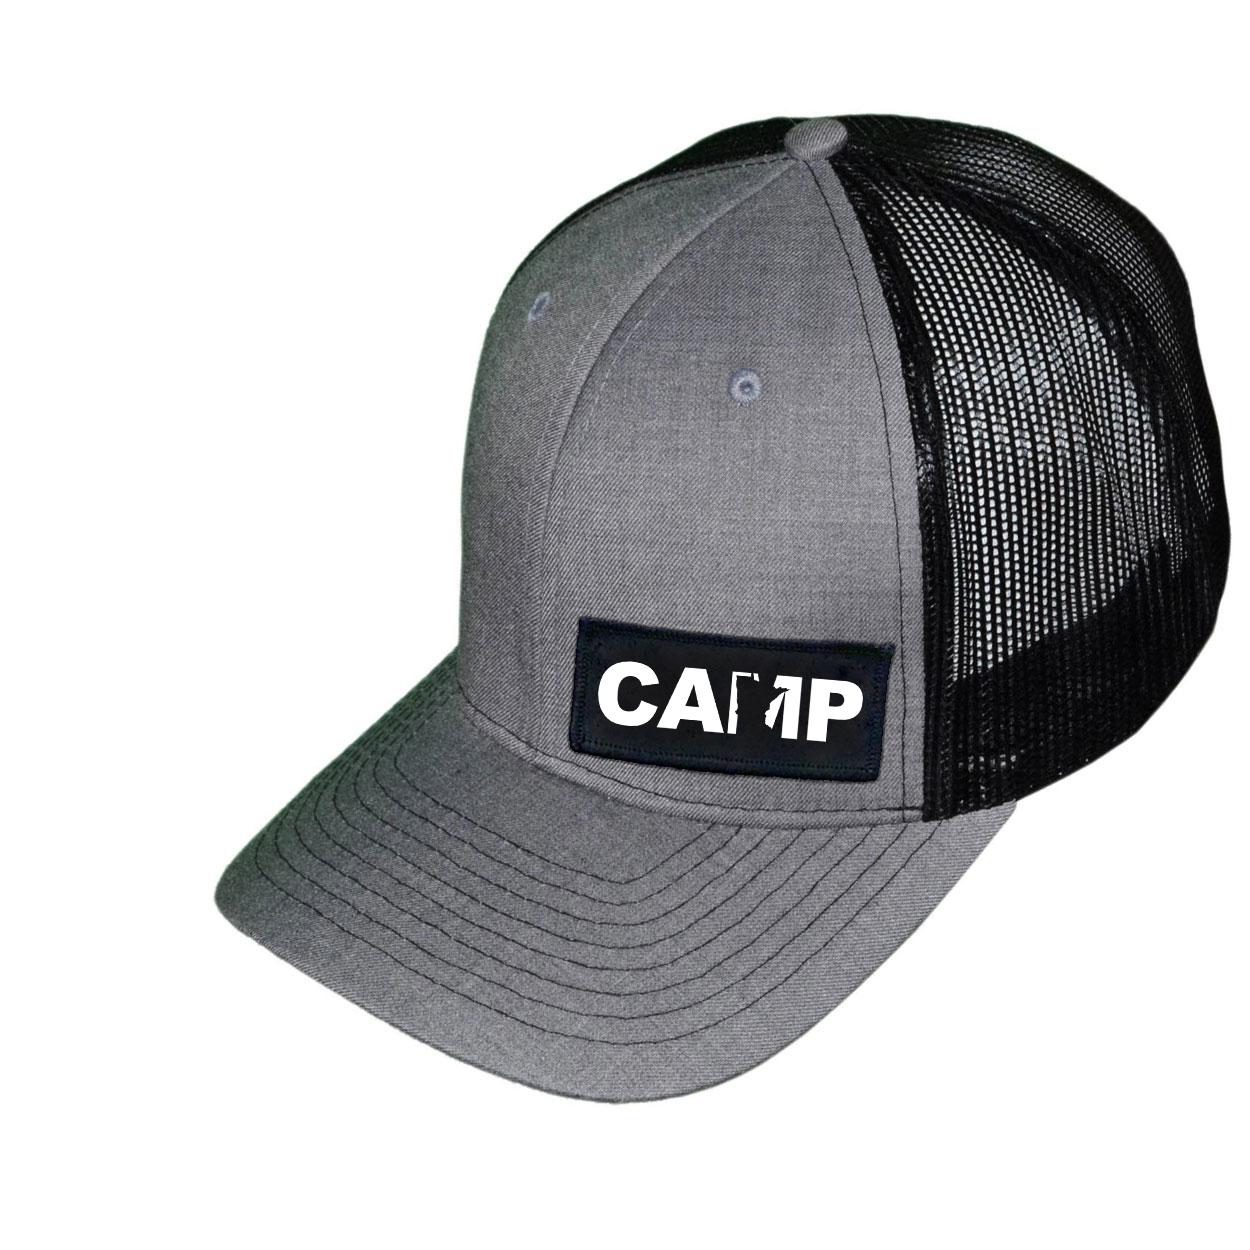 Camp Minnesota Night Out Woven Patch Snapback Trucker Hat Heather Gray/Black (White Logo)